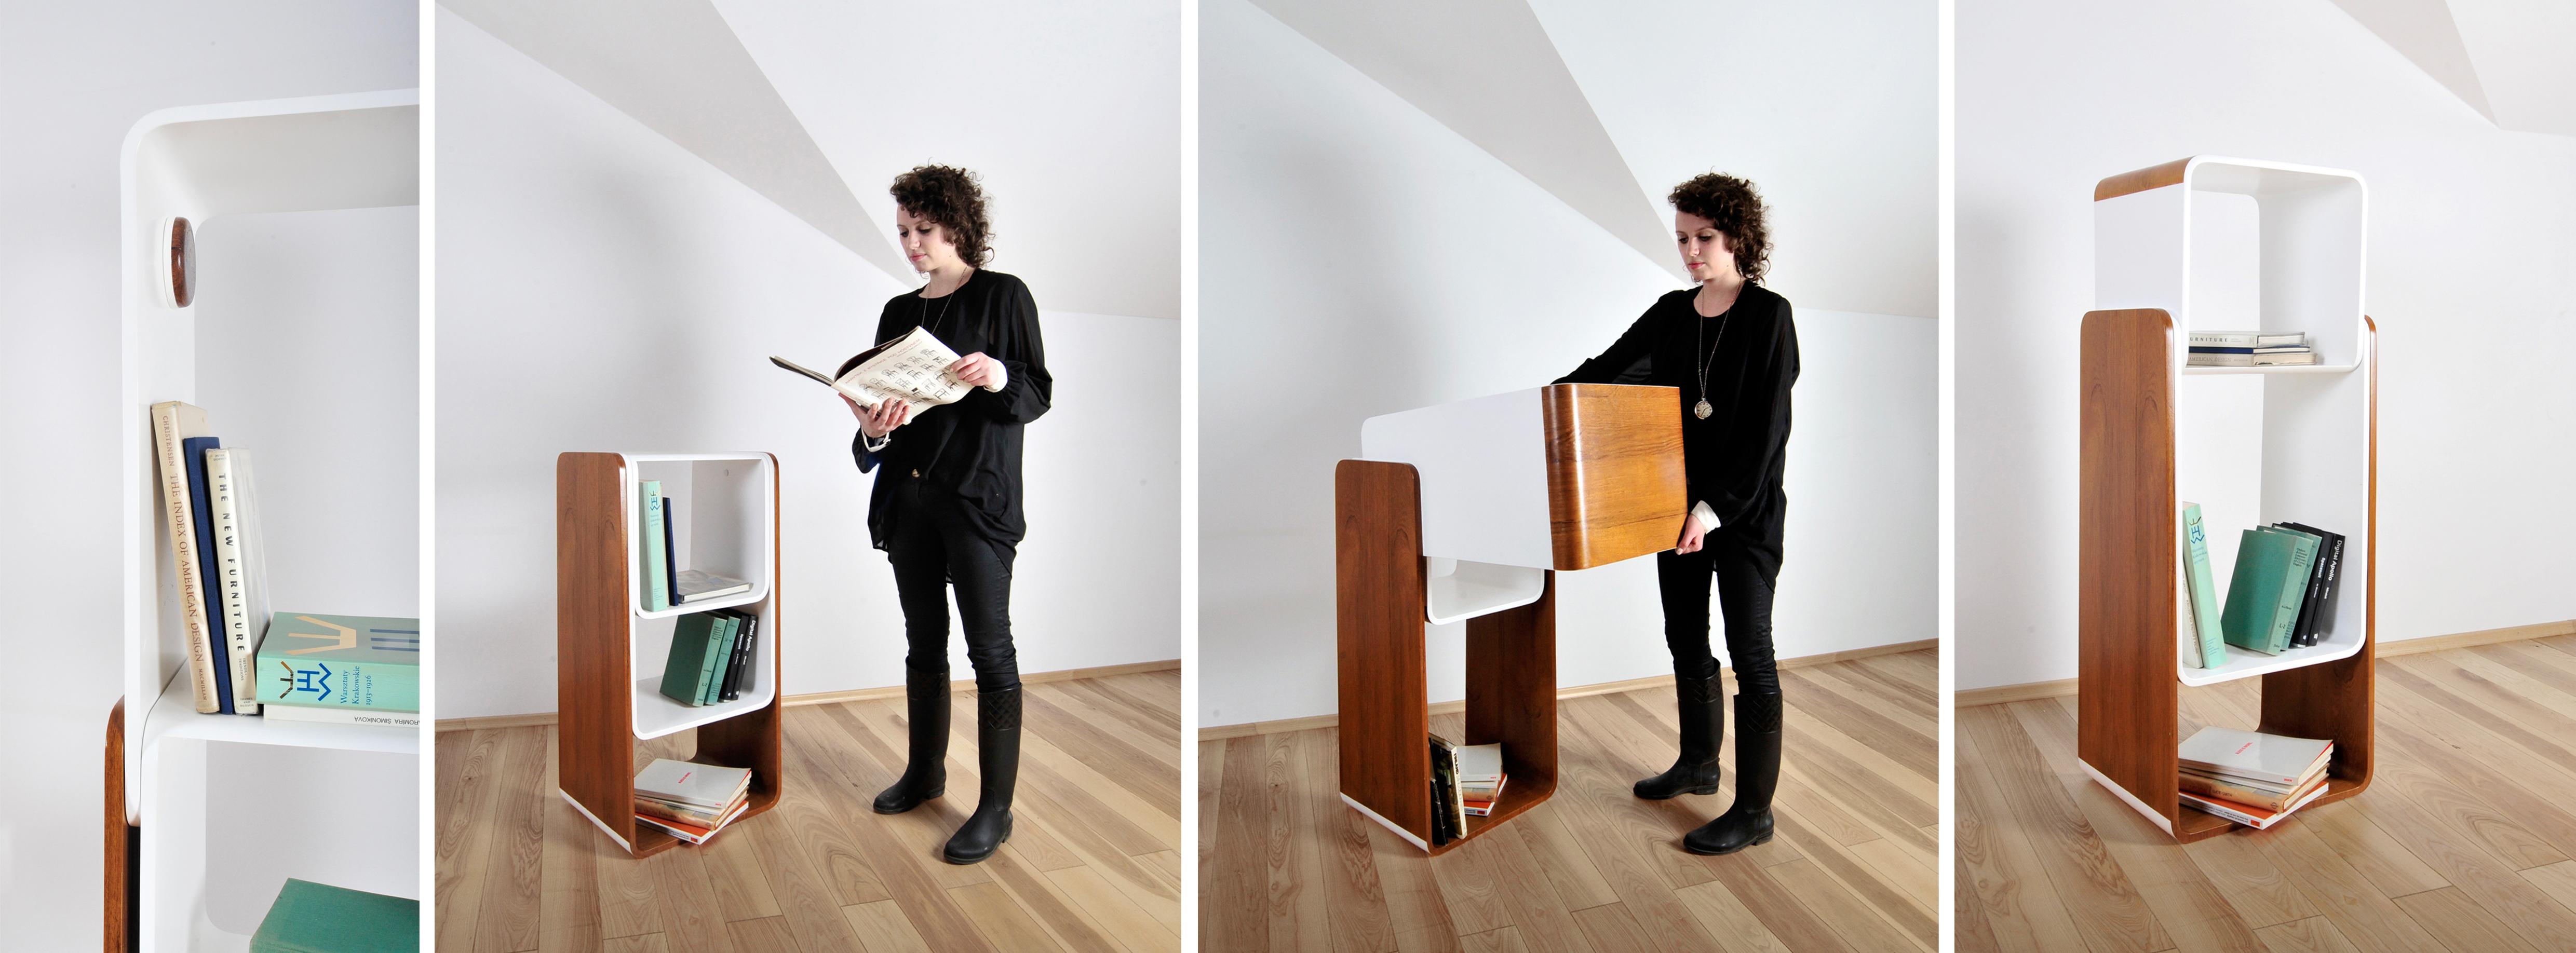 Aino mebel wielofunkcyjny owcydizajnu for How to choose an architect for remodel